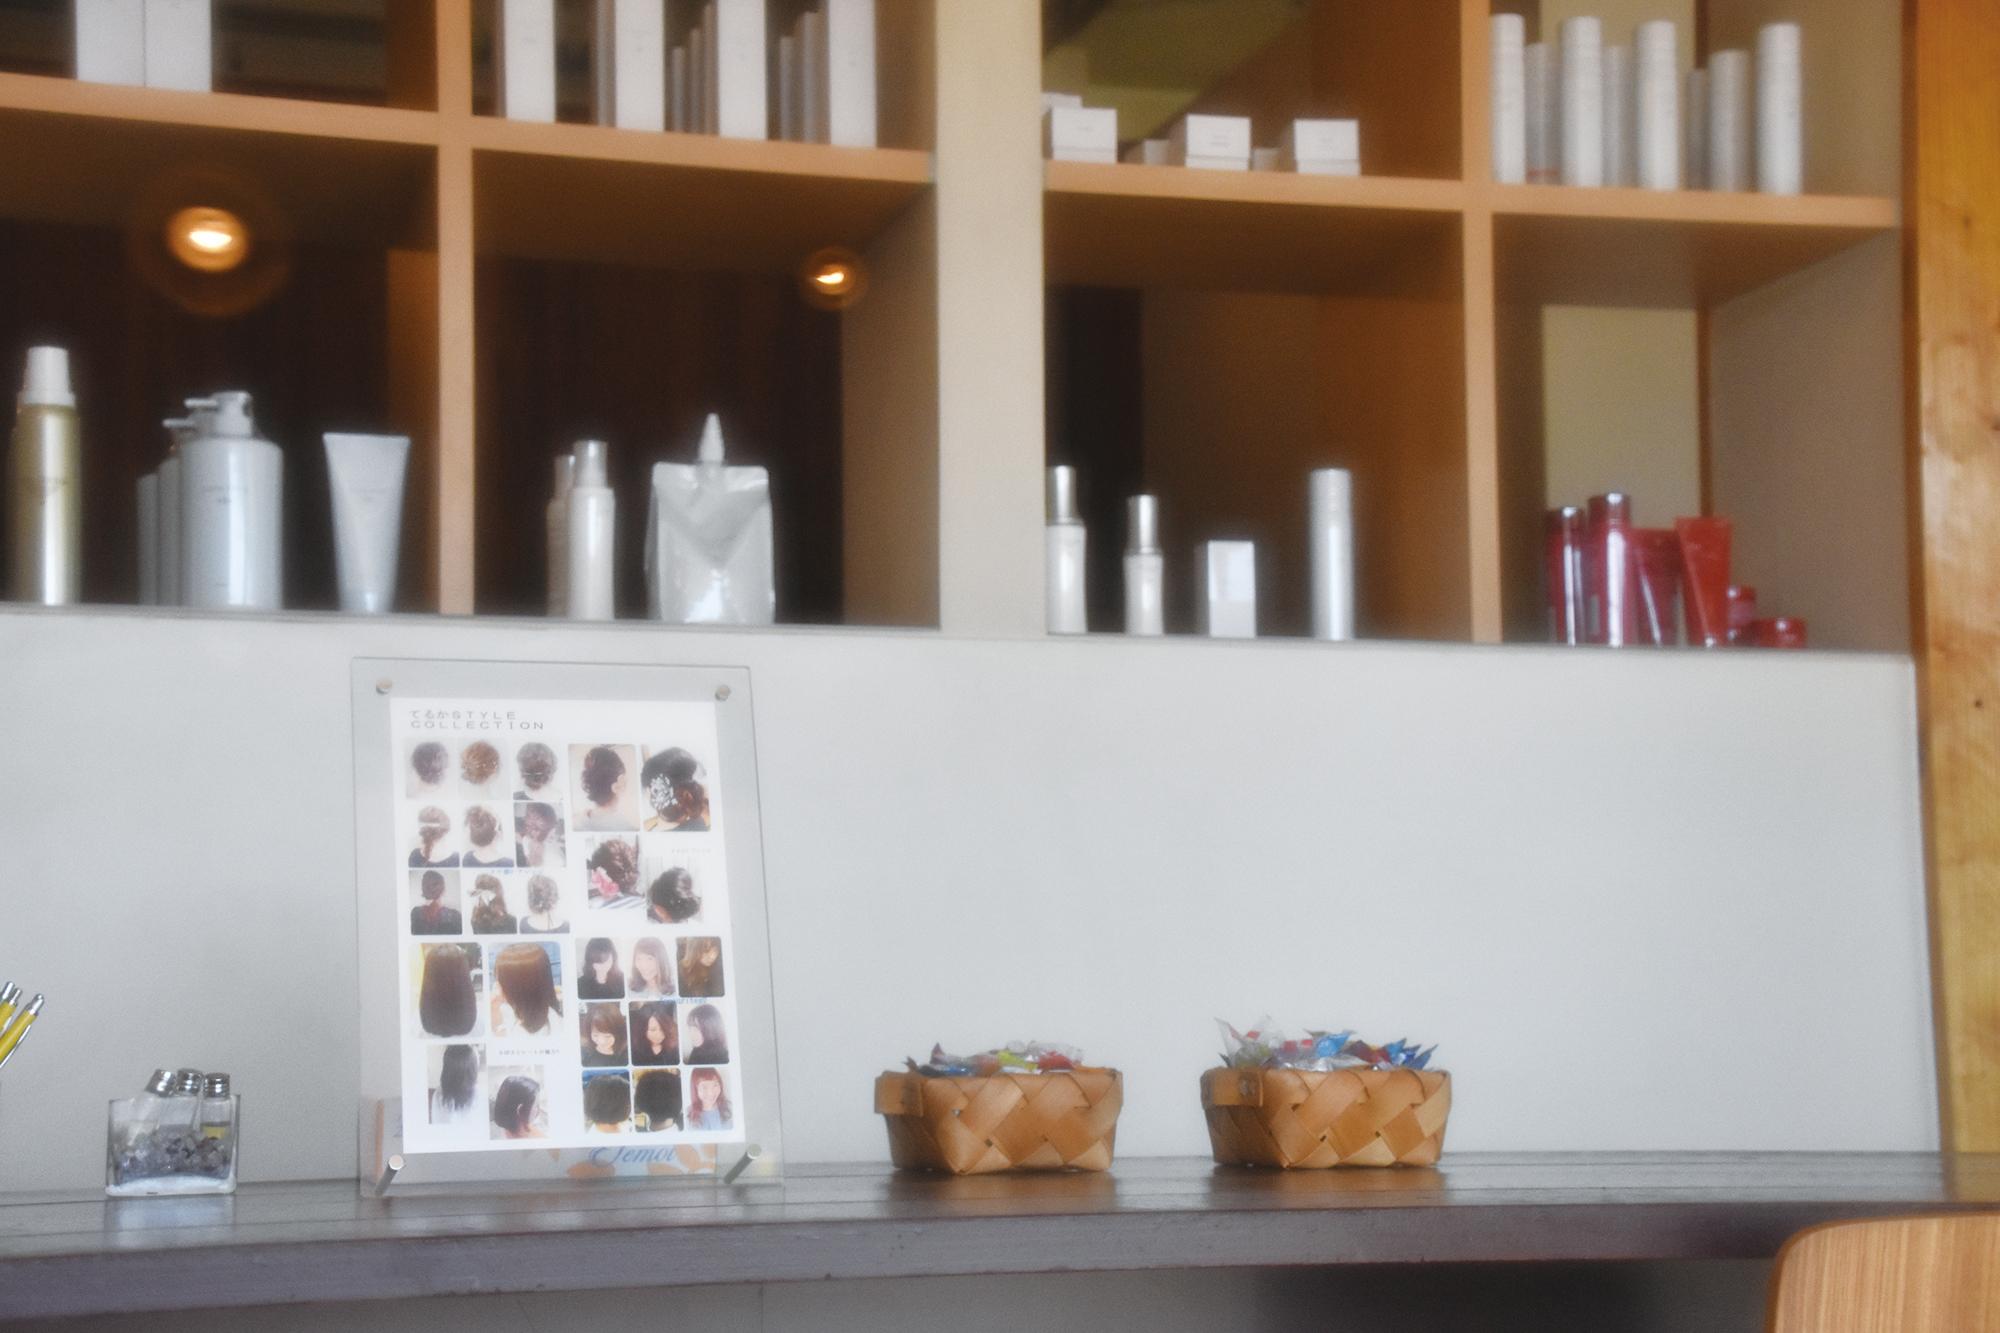 shinehead 美容室 | 和歌山県橋本市 | スタイド画像2